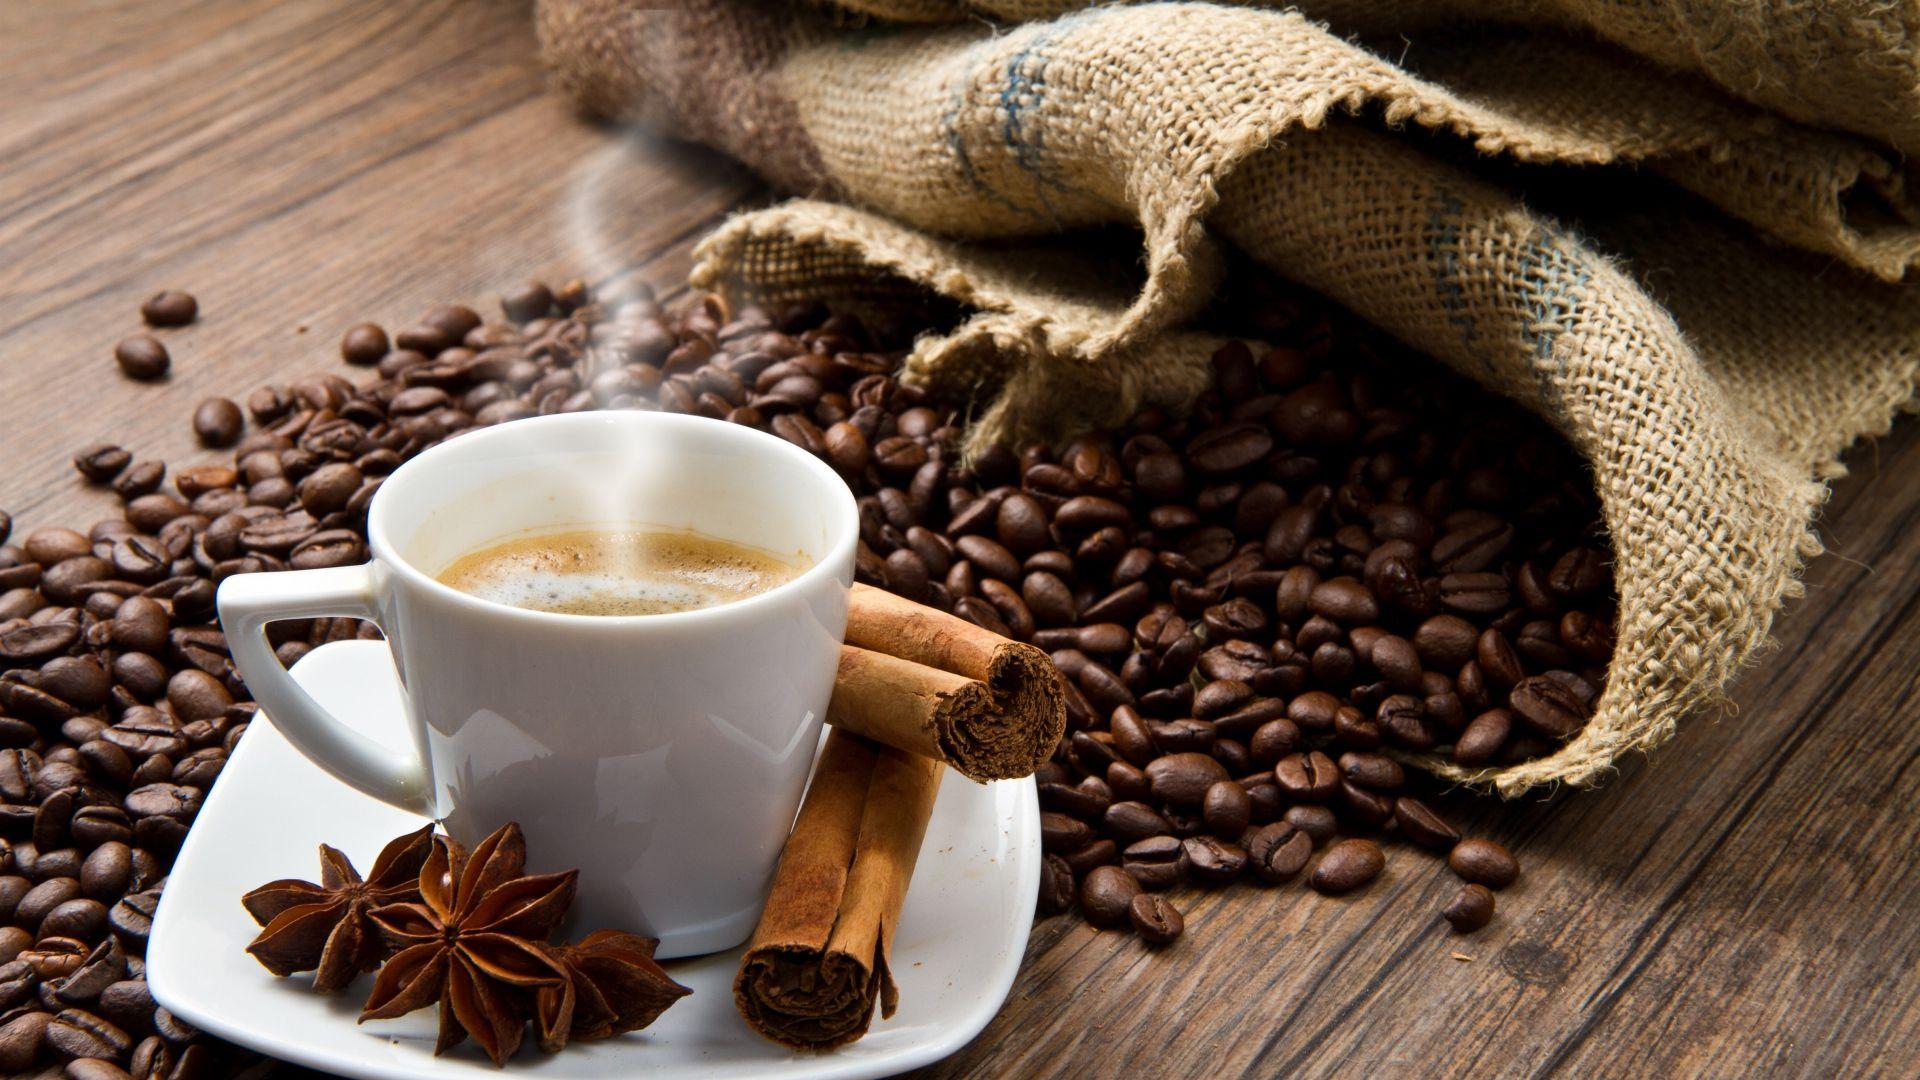 #NationalCoffeeDay #CoffeeLovers #CoffeeDay